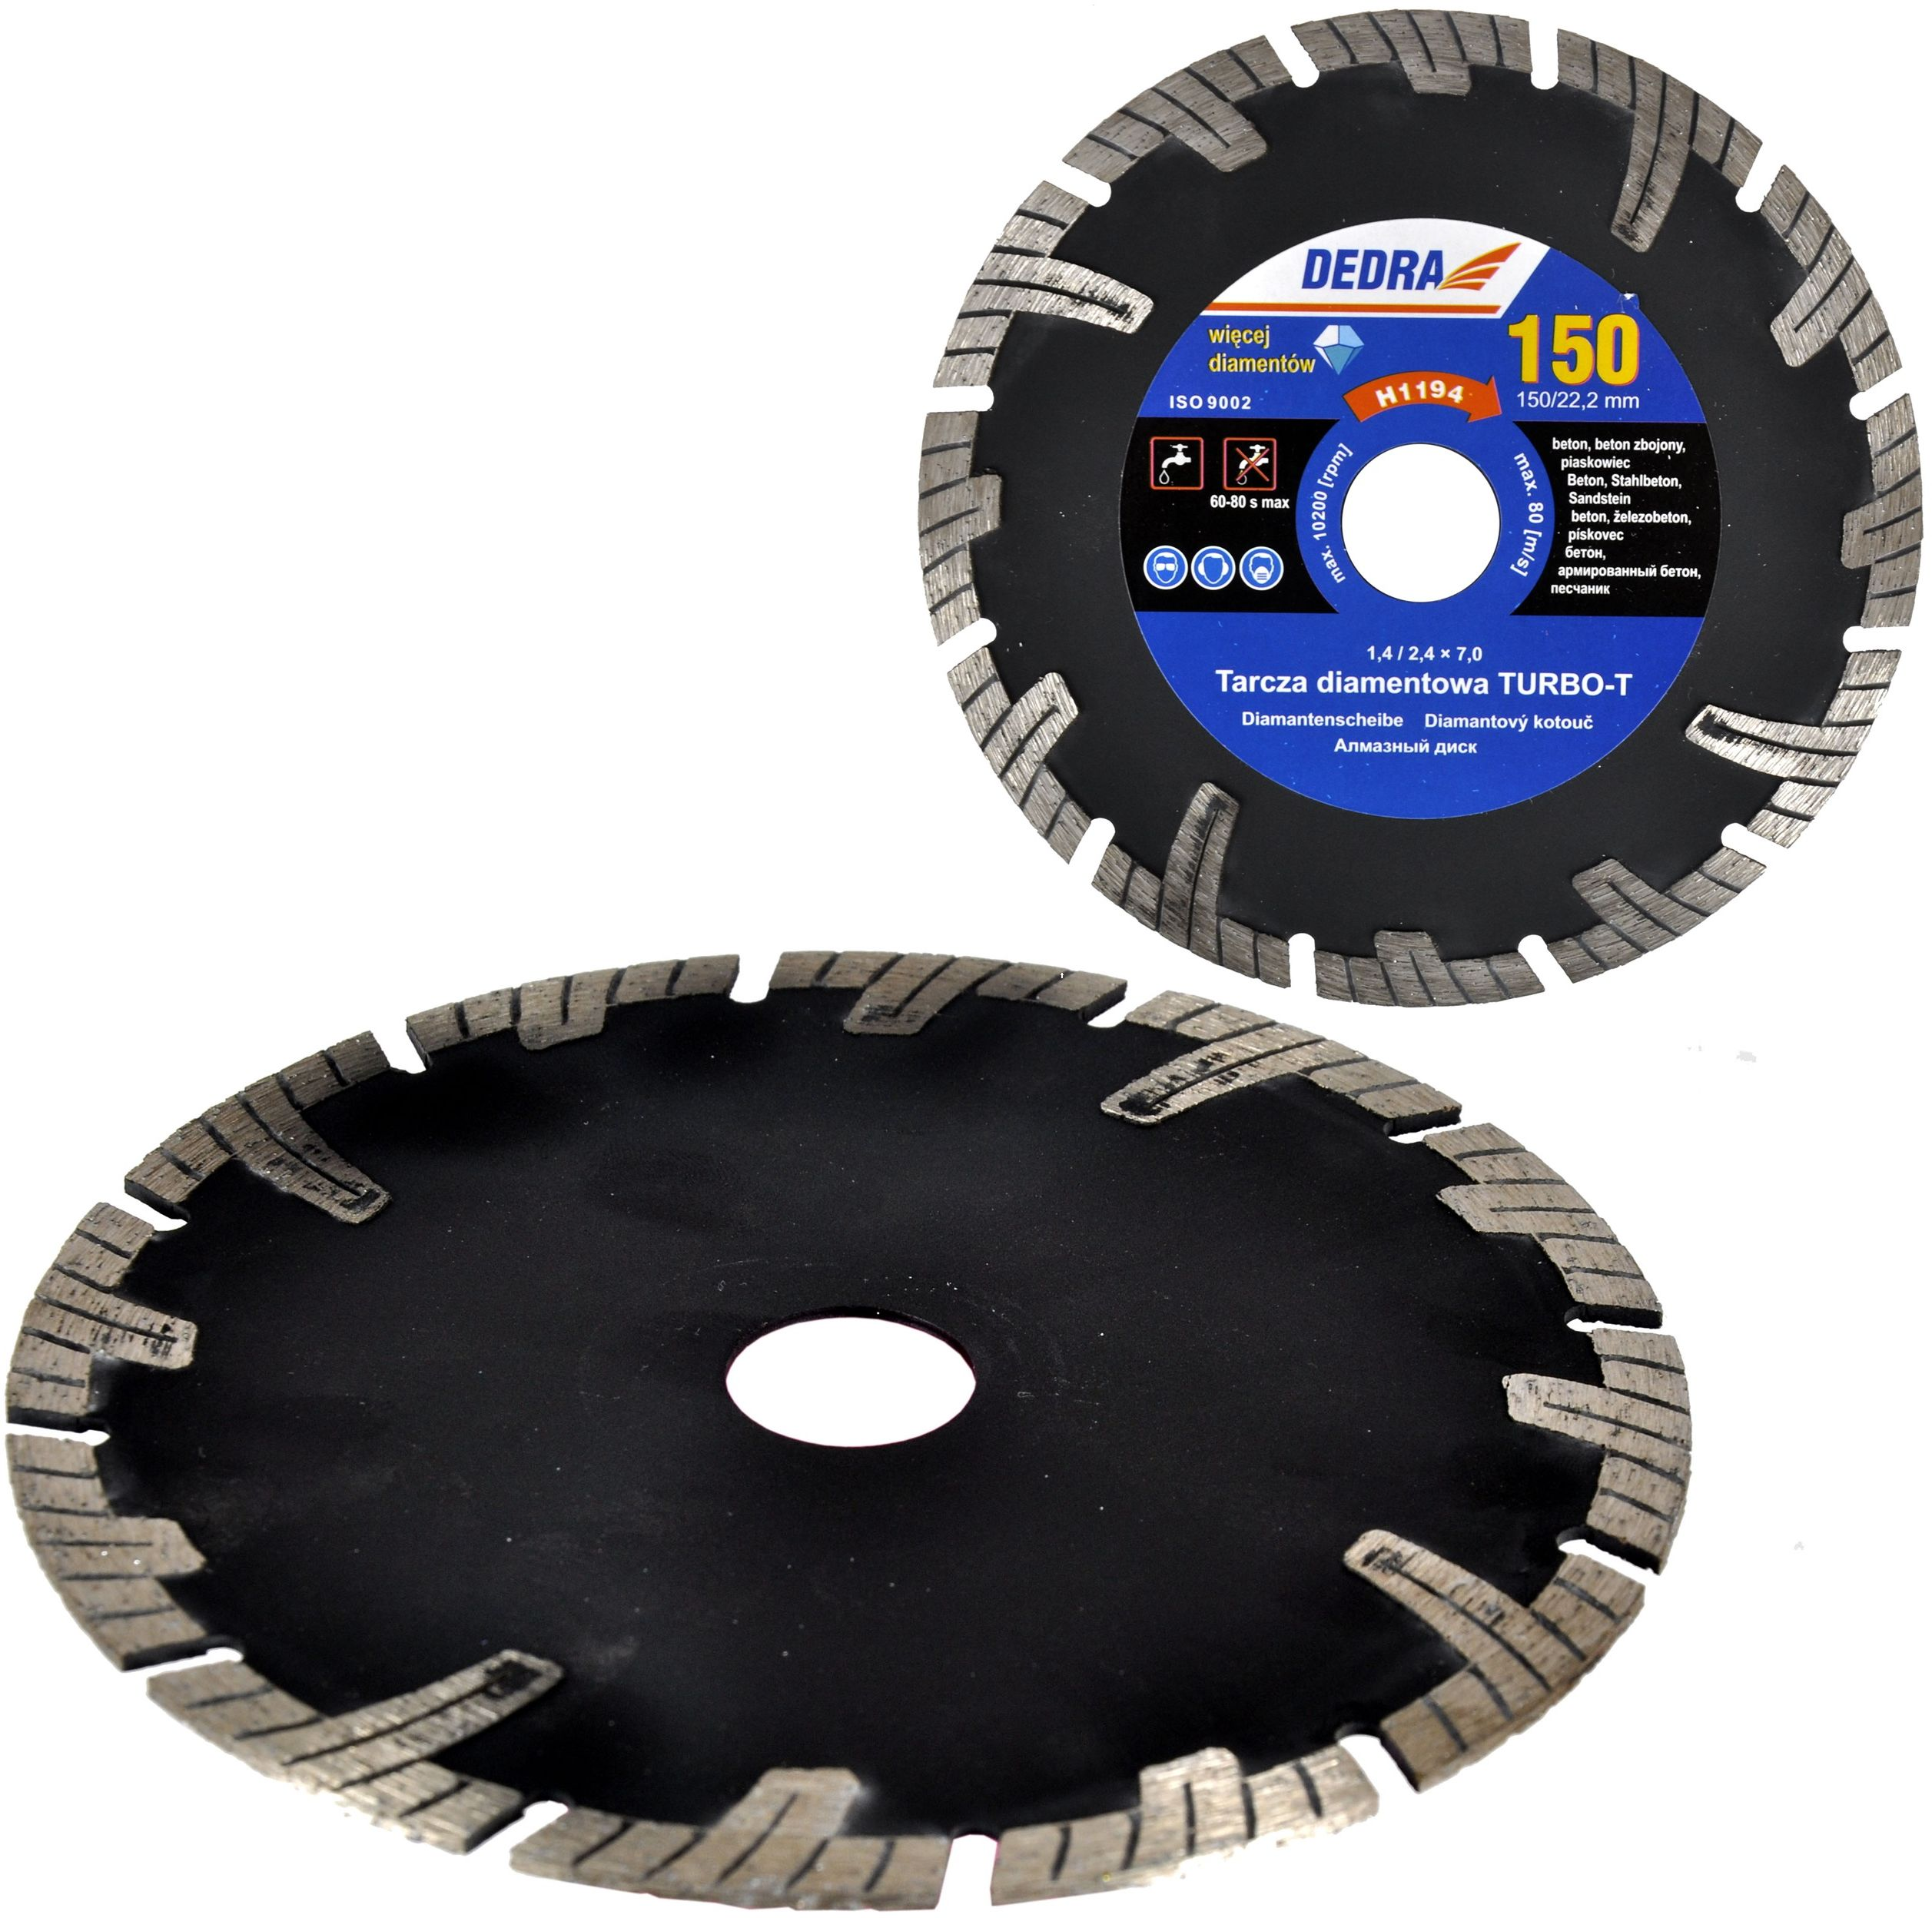 Piła tarczowa tarcza diamentowa 115mm 22,2 betonu